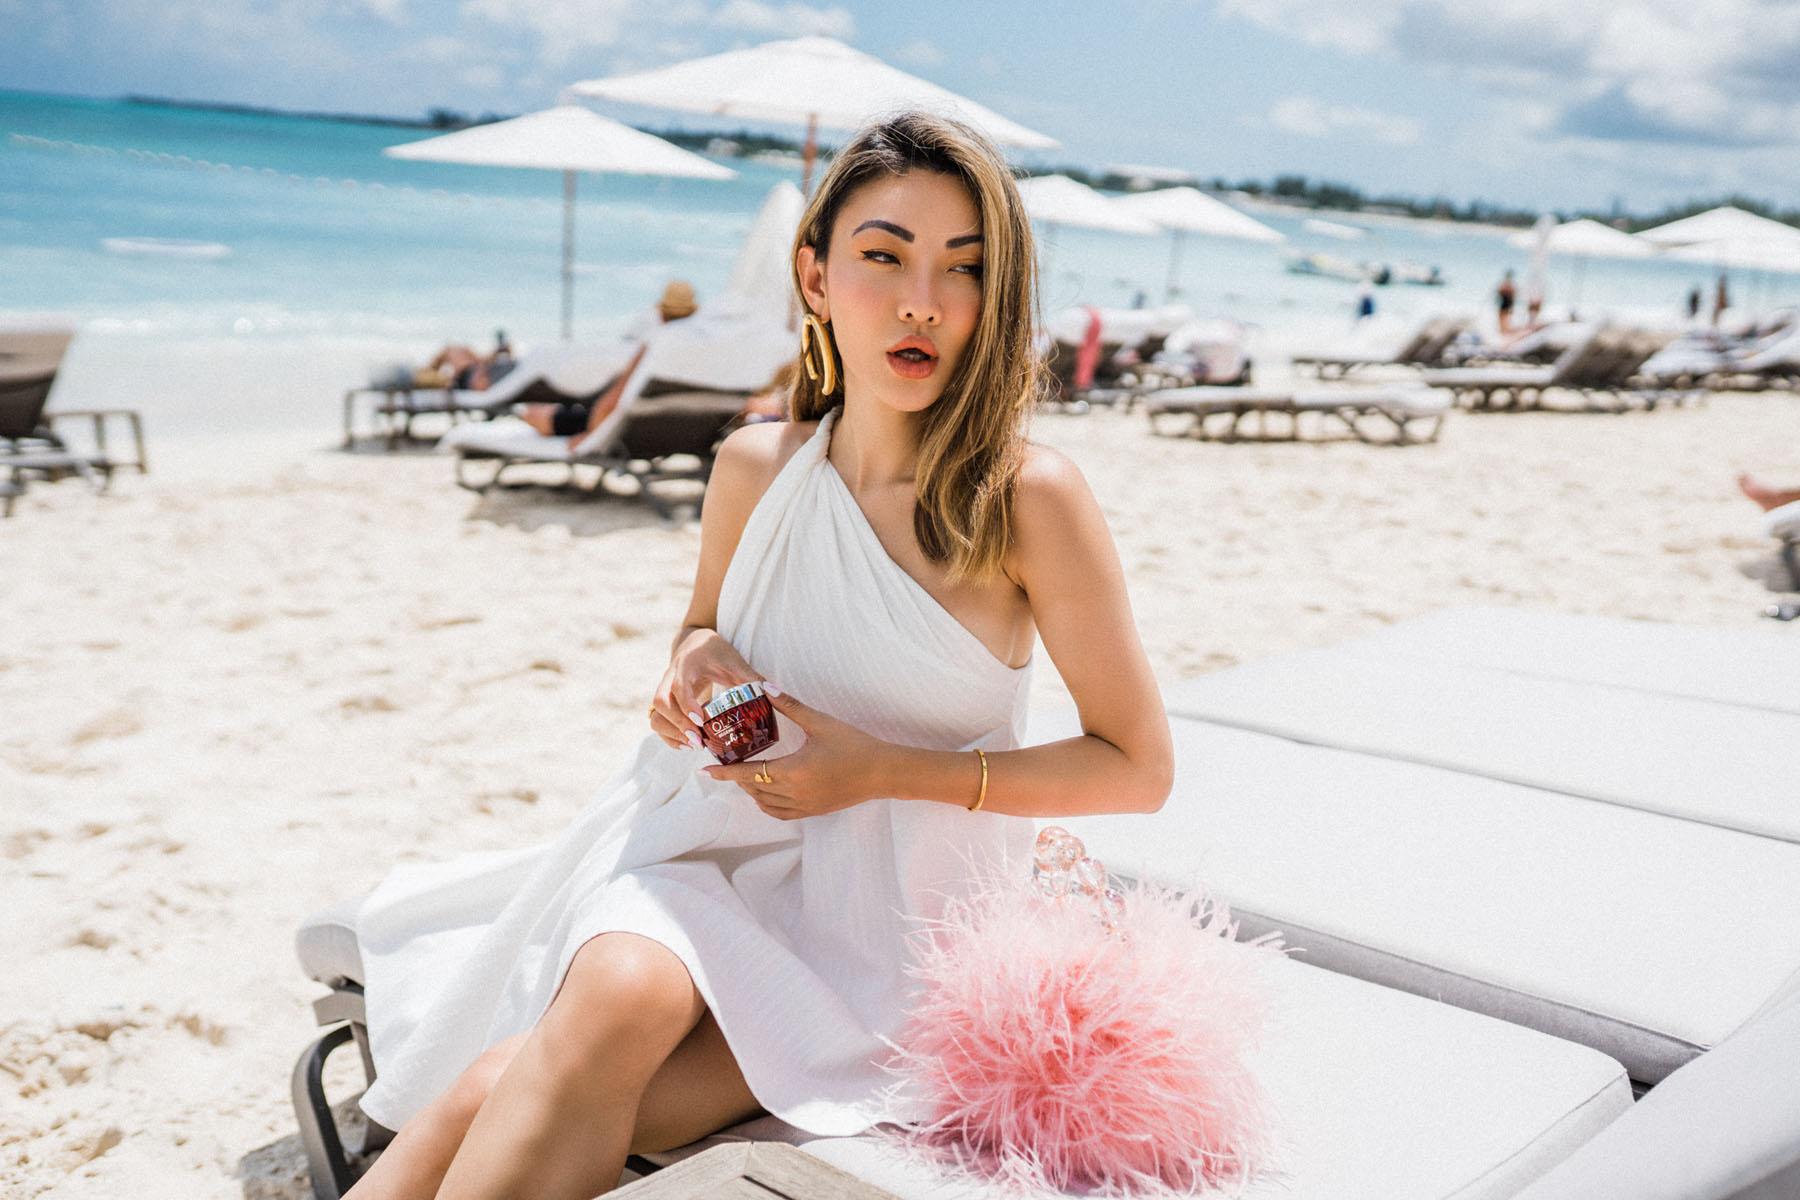 Olay regenerist, essential moisturizers for fresh summer skin, beach // Notjessfashion.com